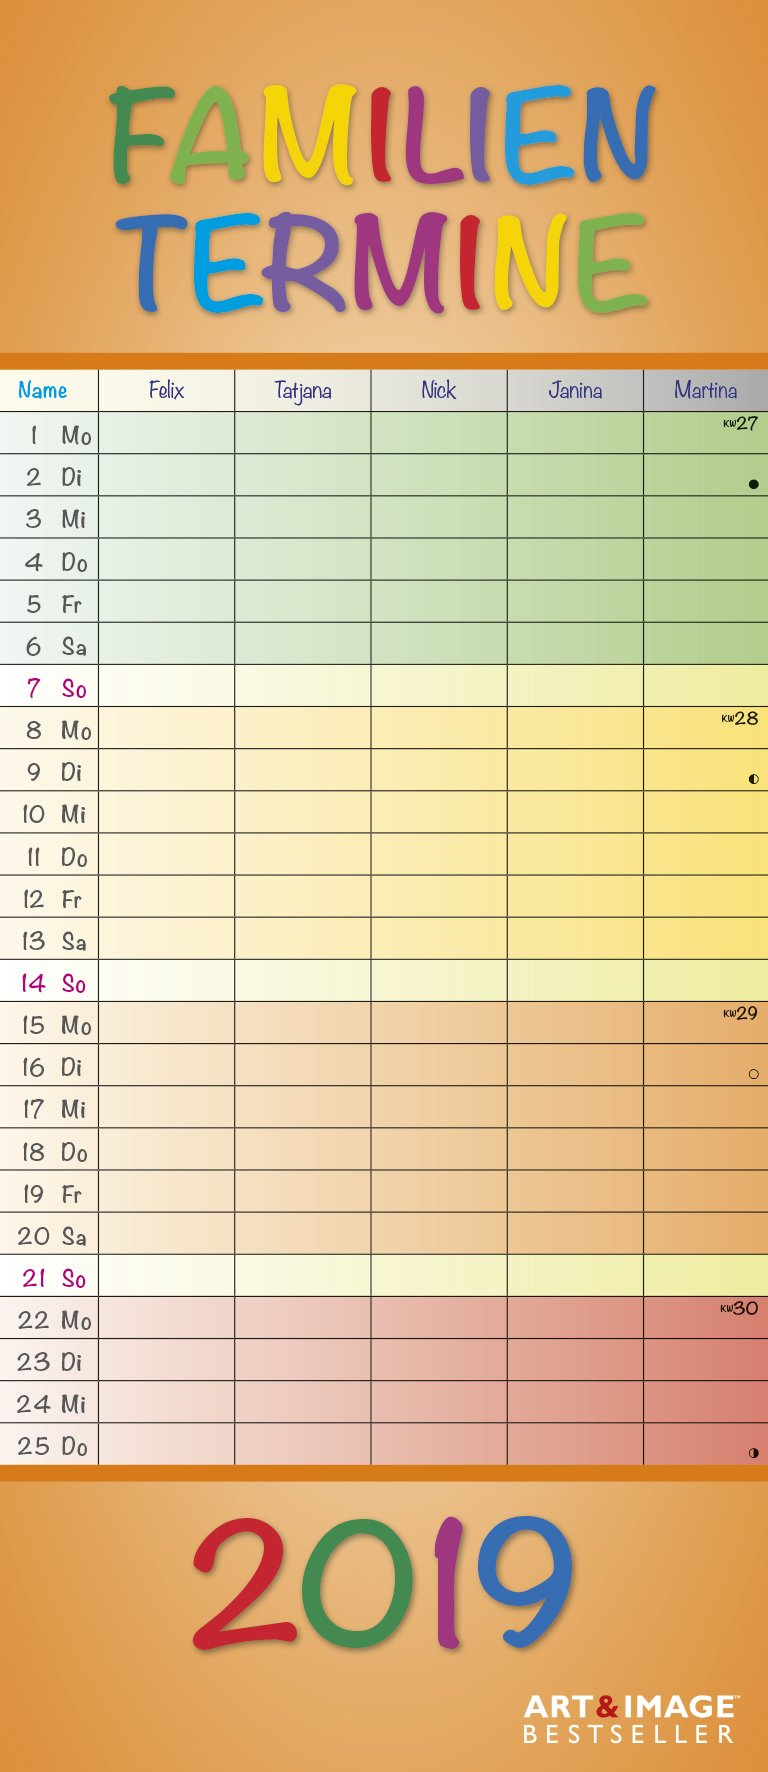 Regenbogen 2019 - A&I Familienplaner mit 5 Spalten, Familienkalender  -  19,5 x 45 cm